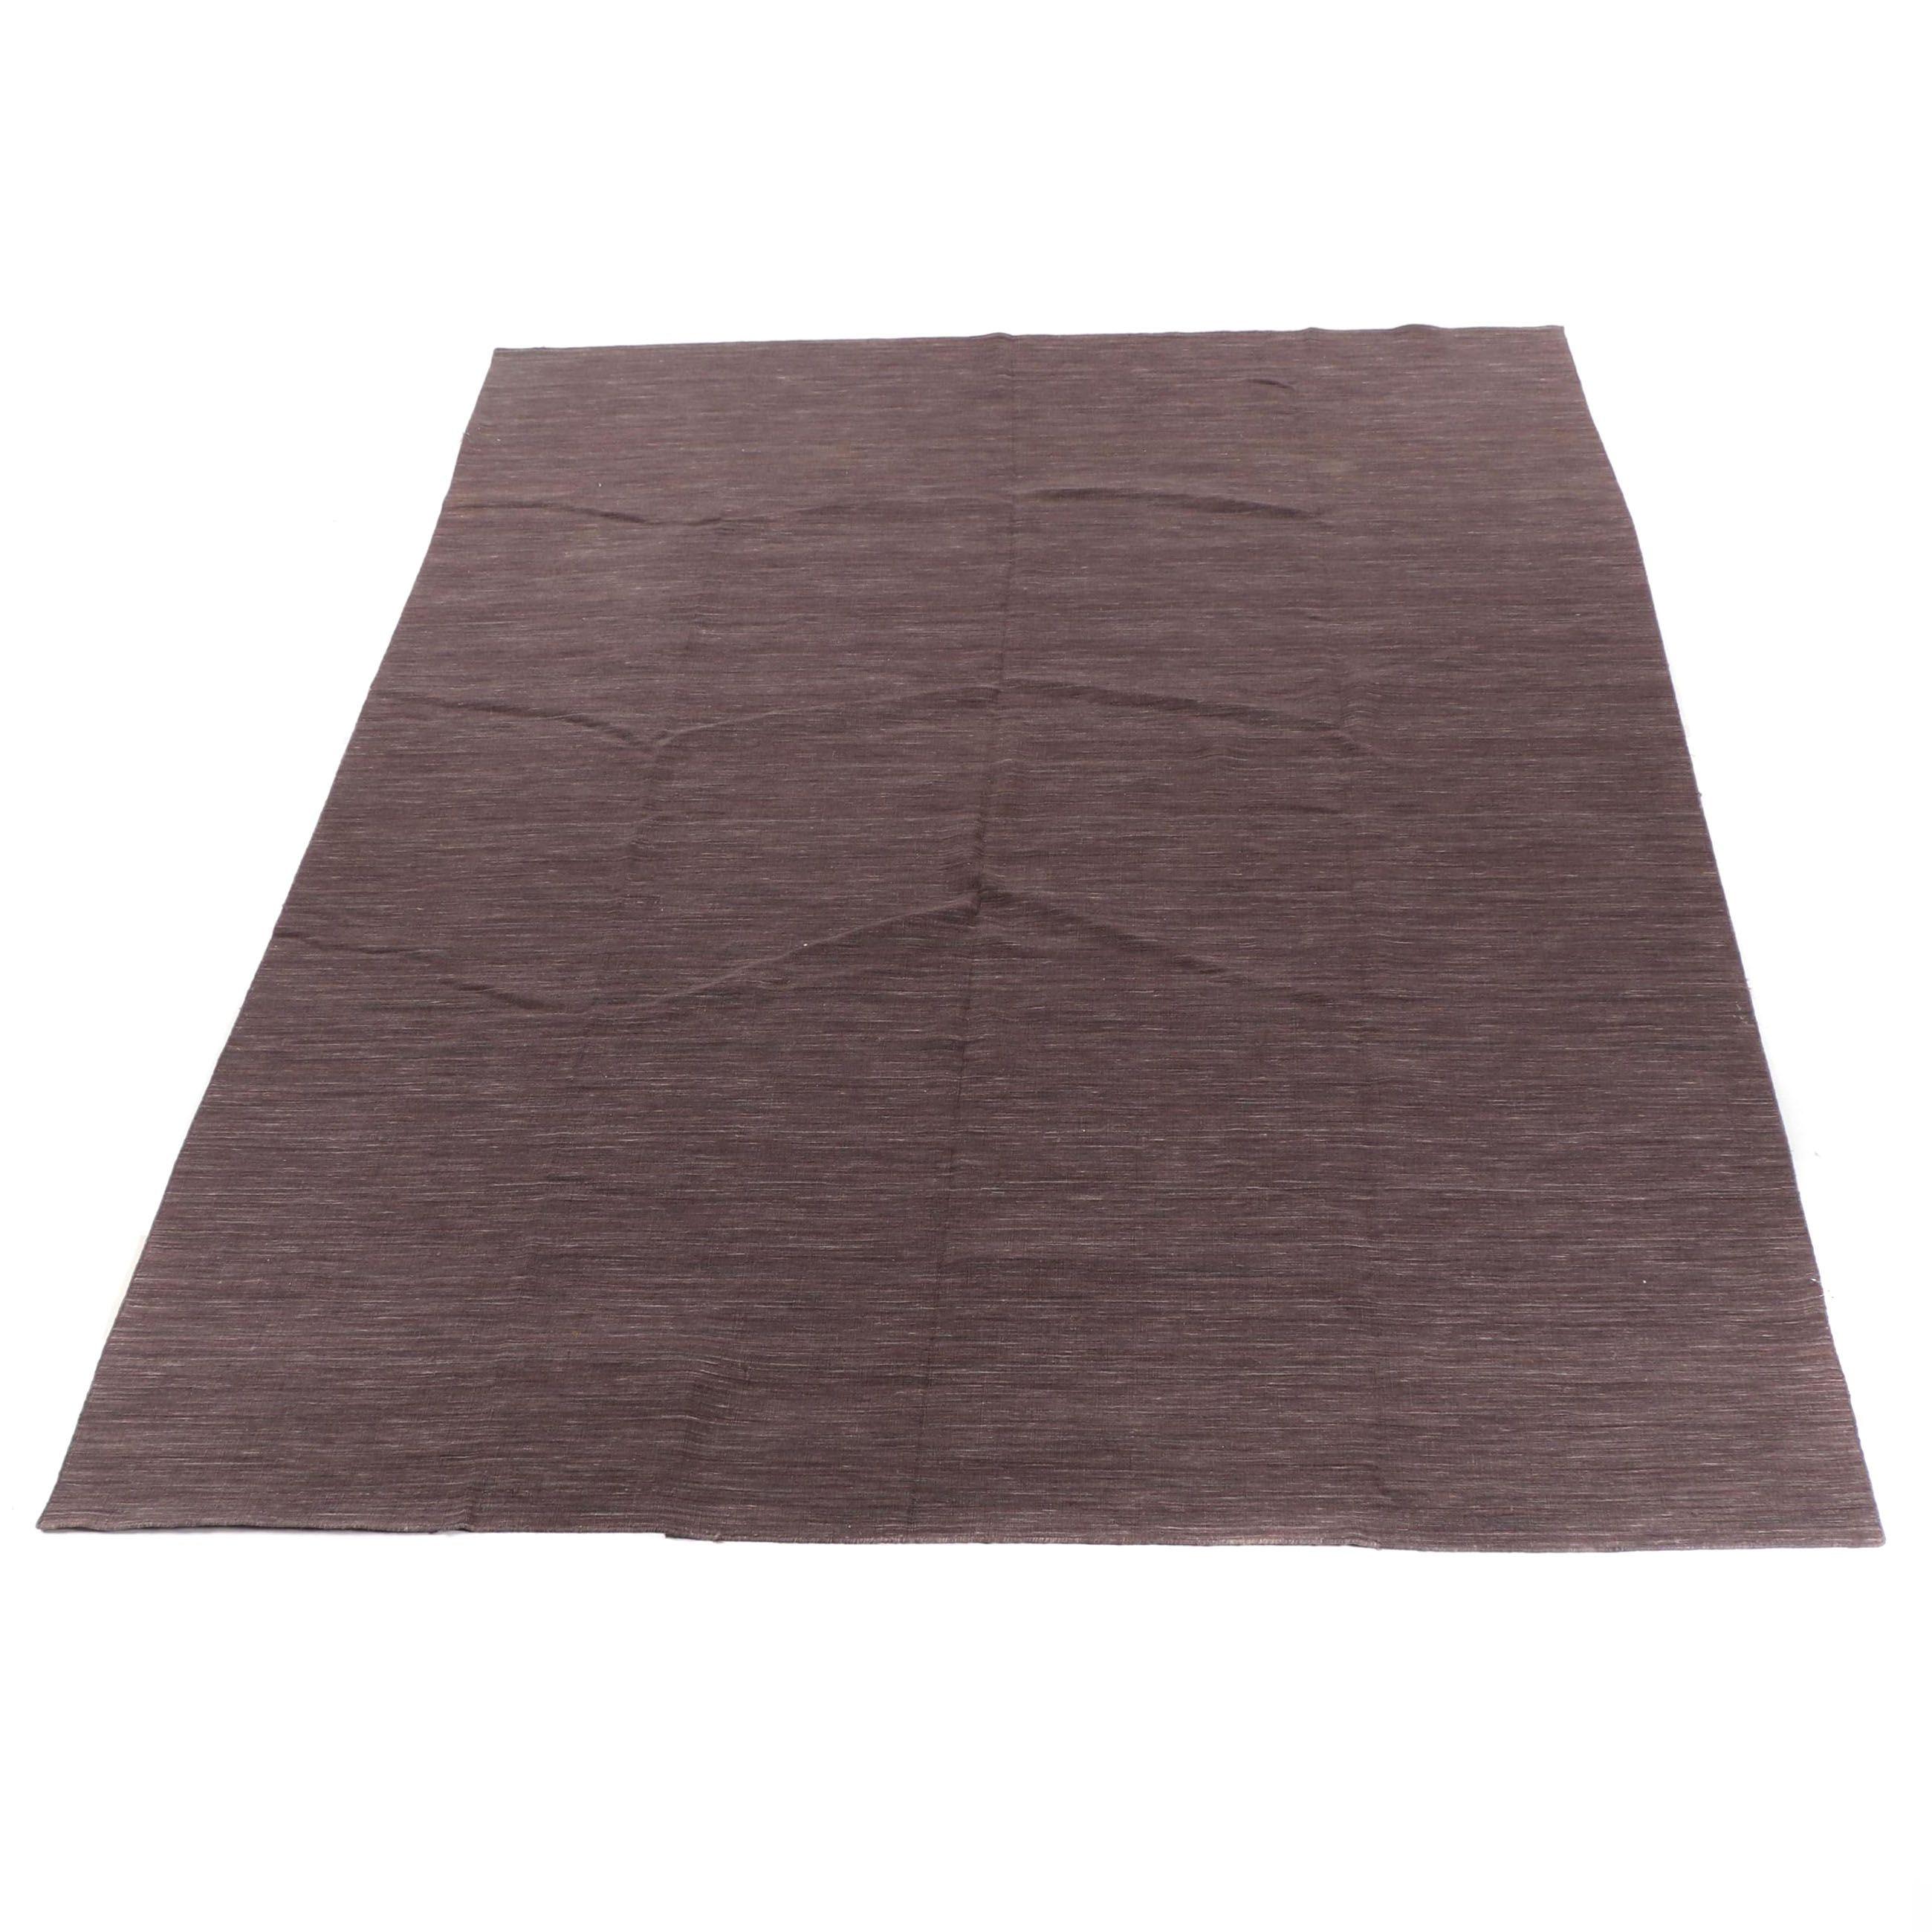 Handwoven Aubergine Indian Wool Room Sized Rug